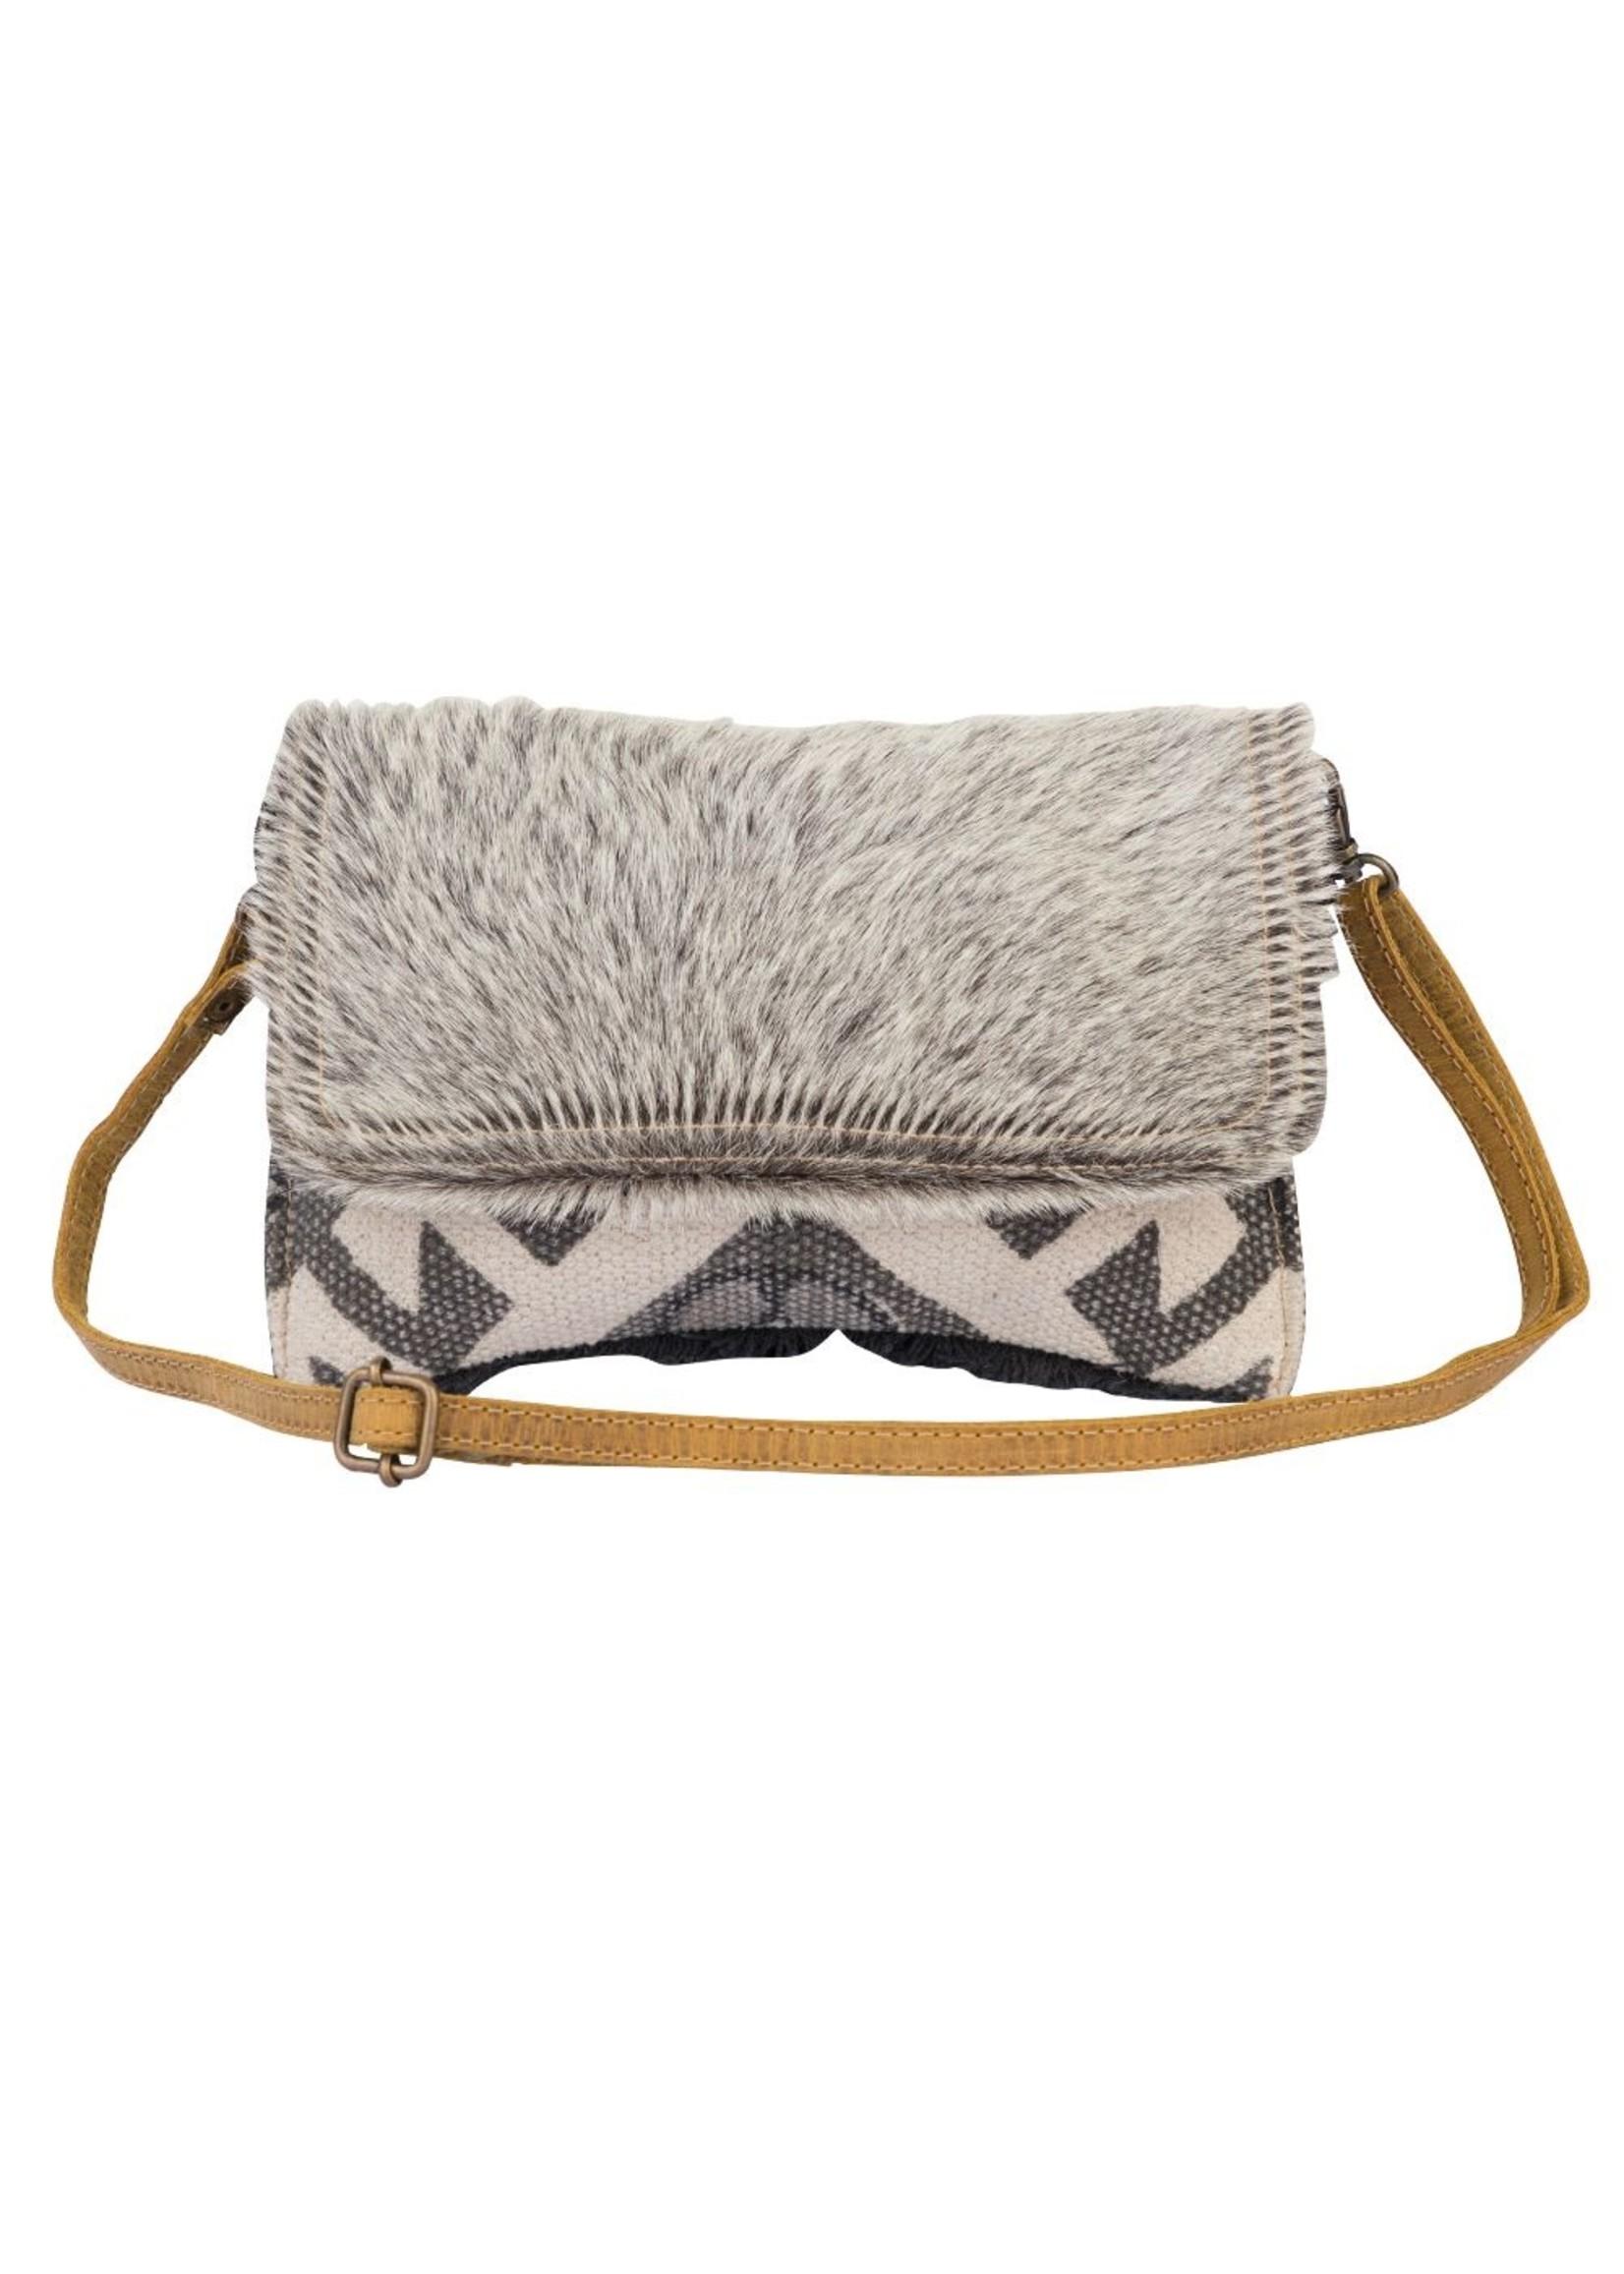 myra bags Little Heroine Small & Crossbody Bag